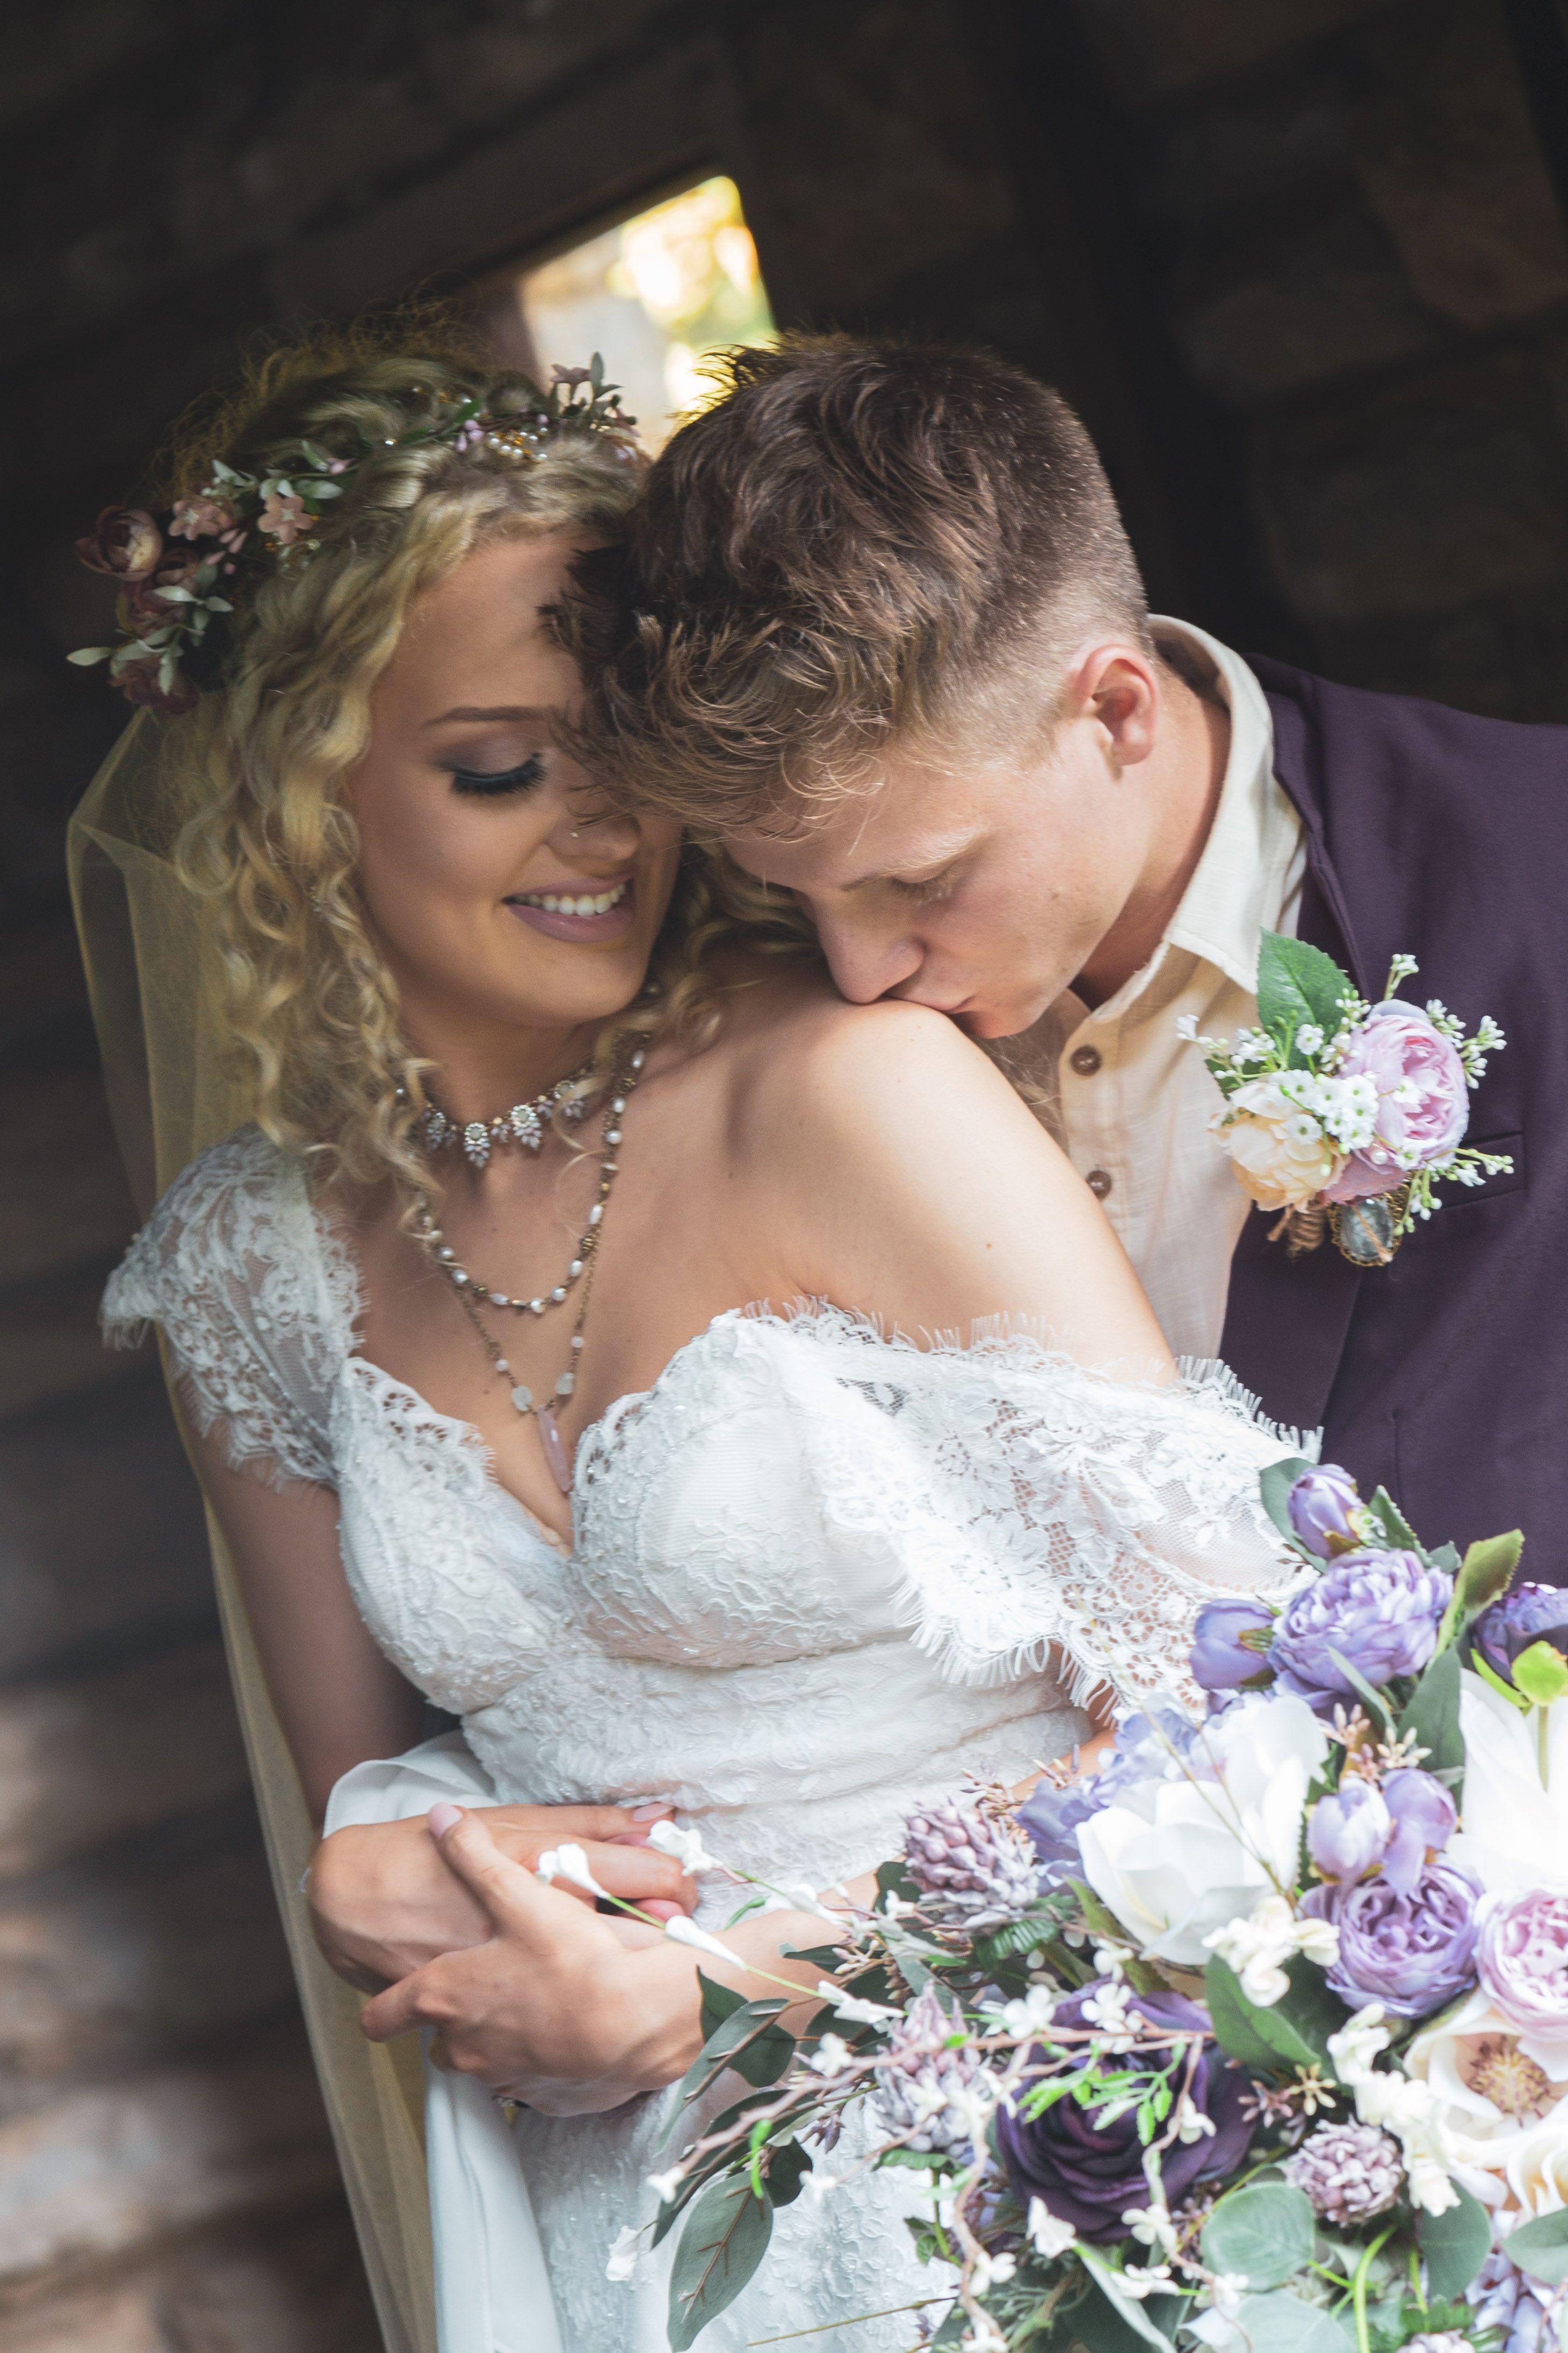 Sexy bride and groom portrait. iowaweddings